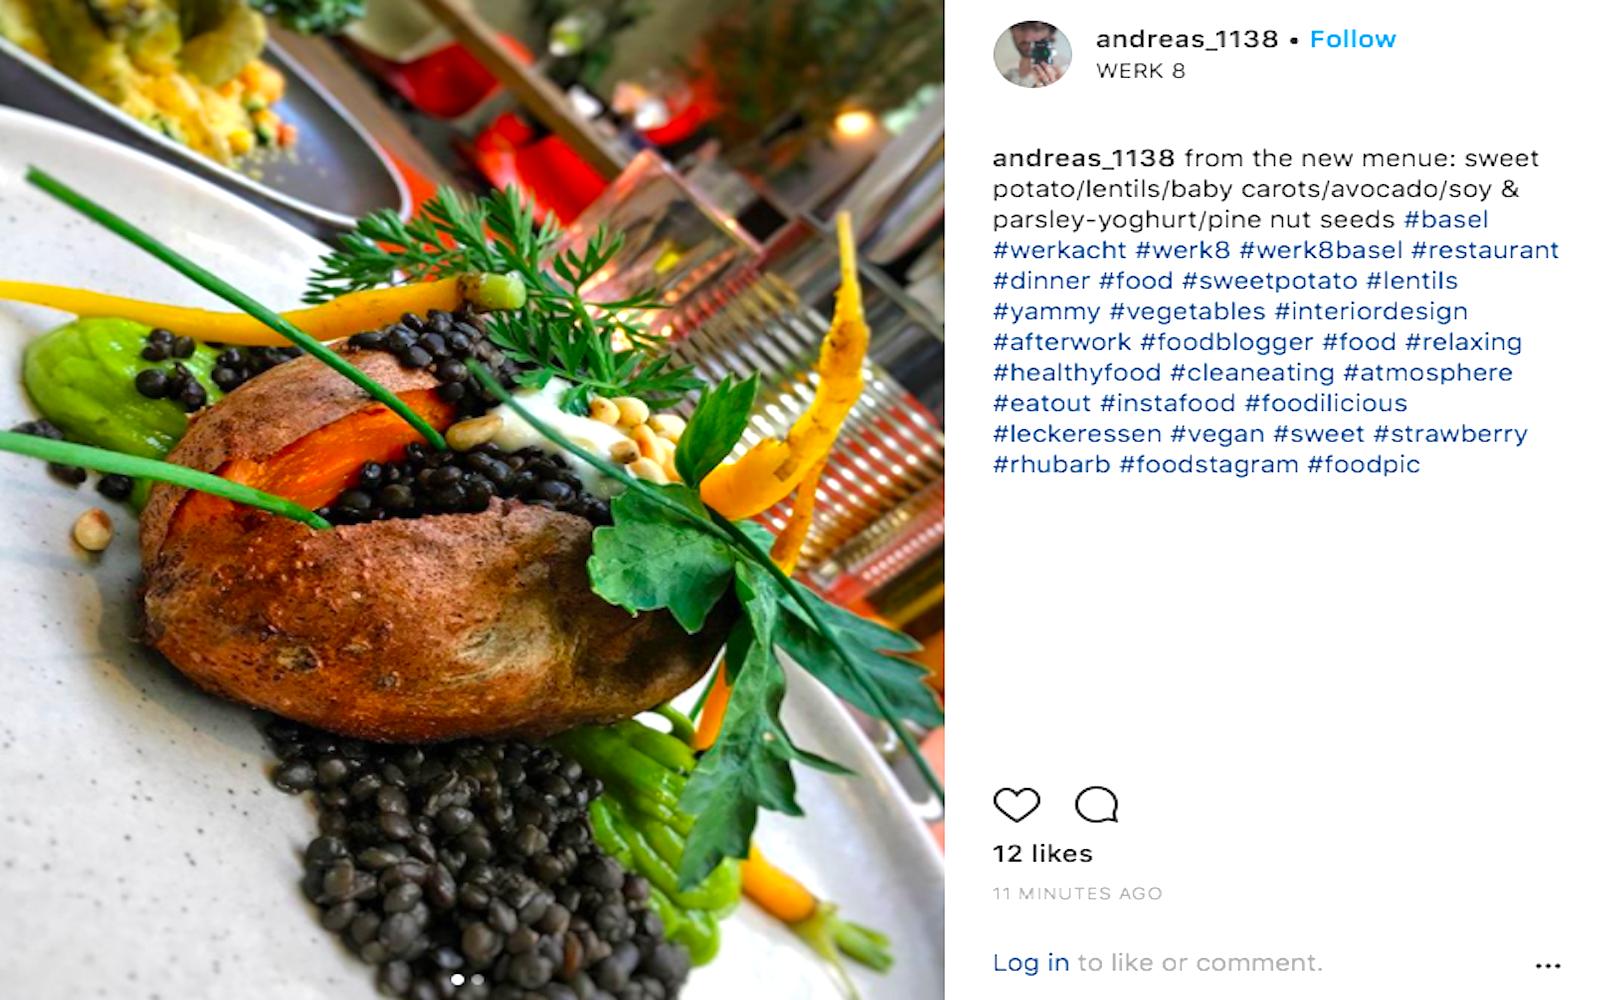 vegan sweet potato instagram photos